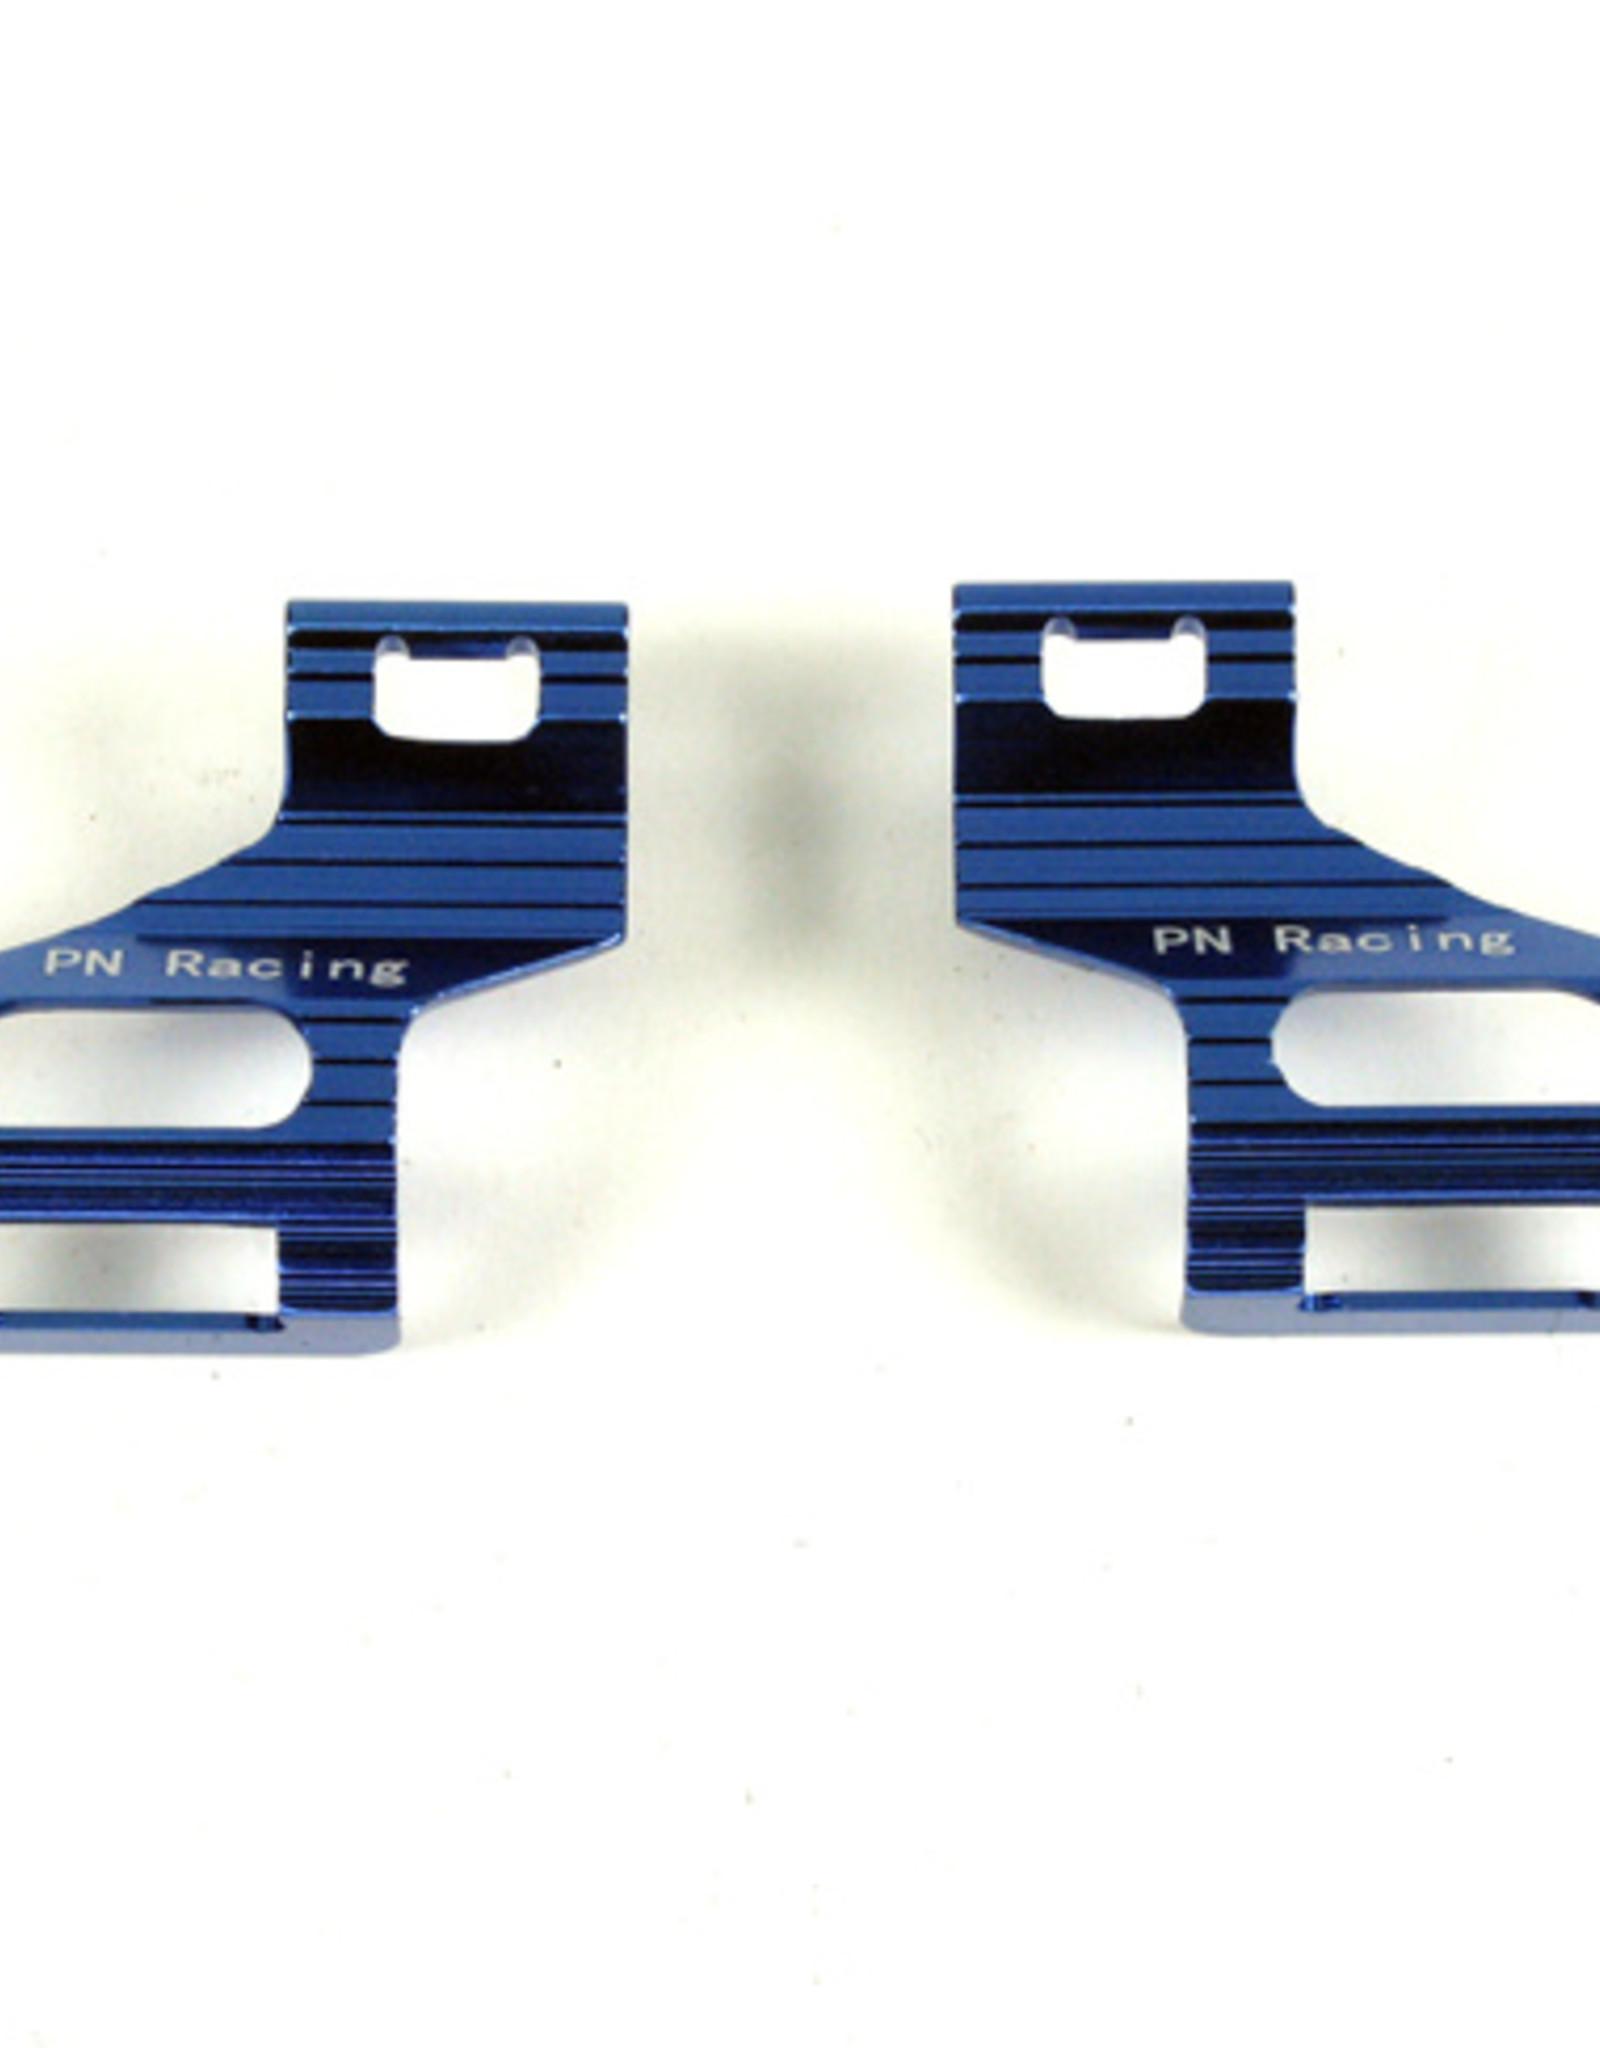 Pn Racing PN Racing Mini-Z MR03 V2 Alm Battery Cover Heatsink (Blue)